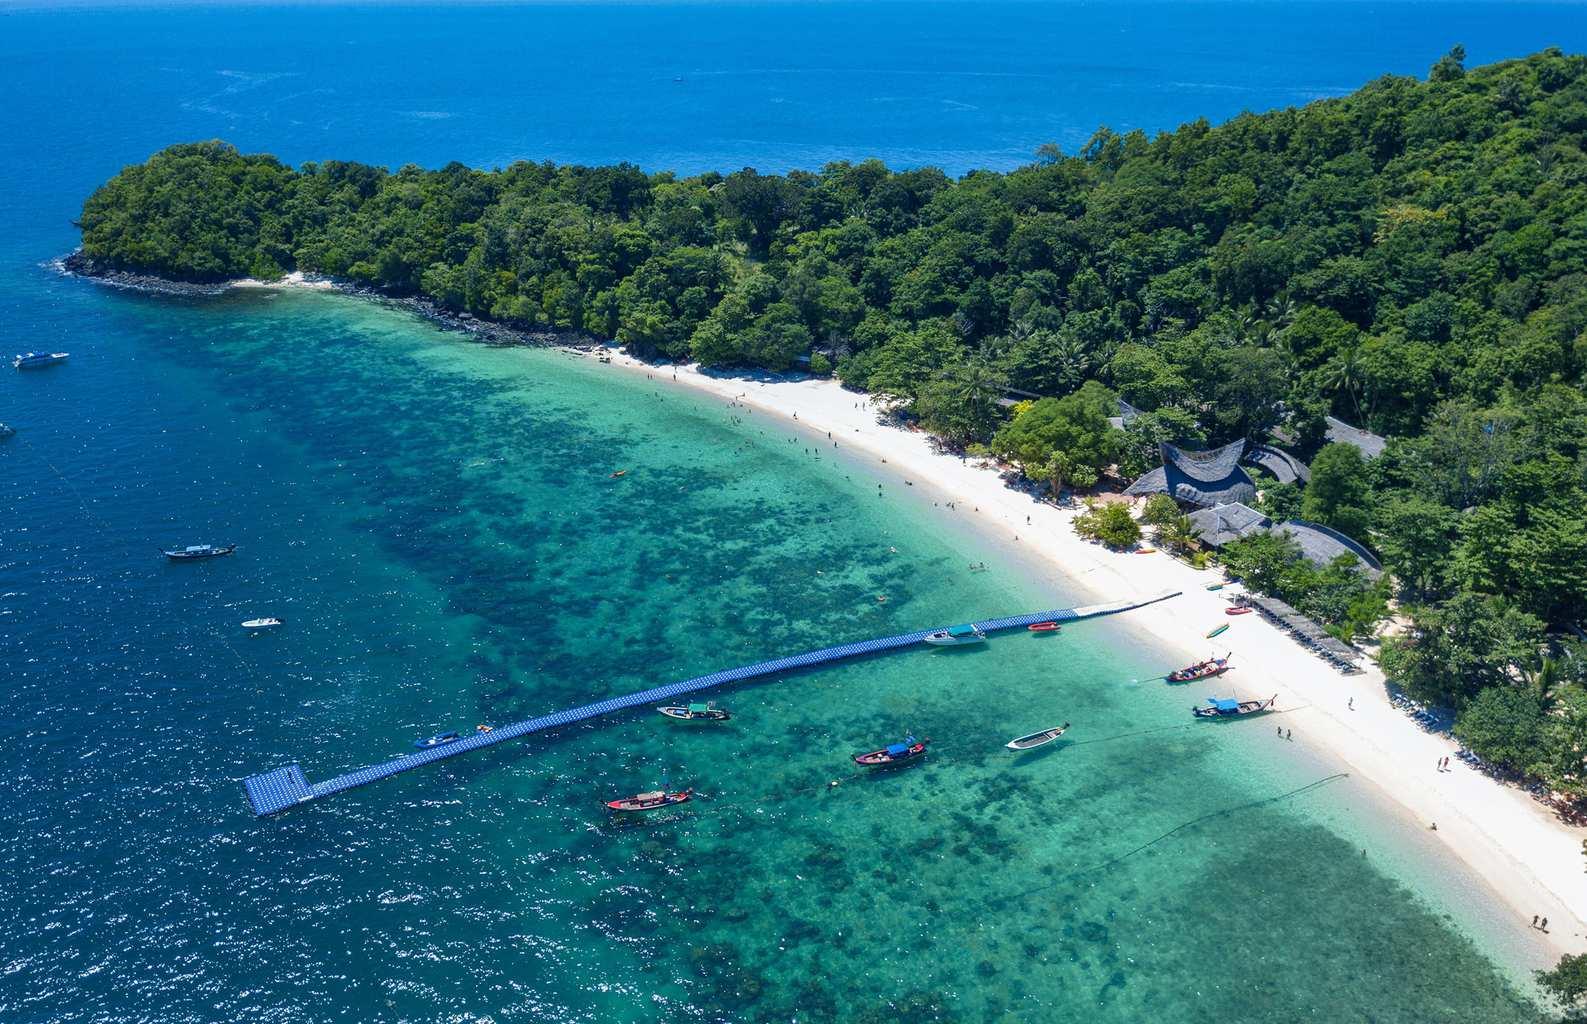 Banana Beach, Koh Hey (Coral) Island, Phuket, Thailand